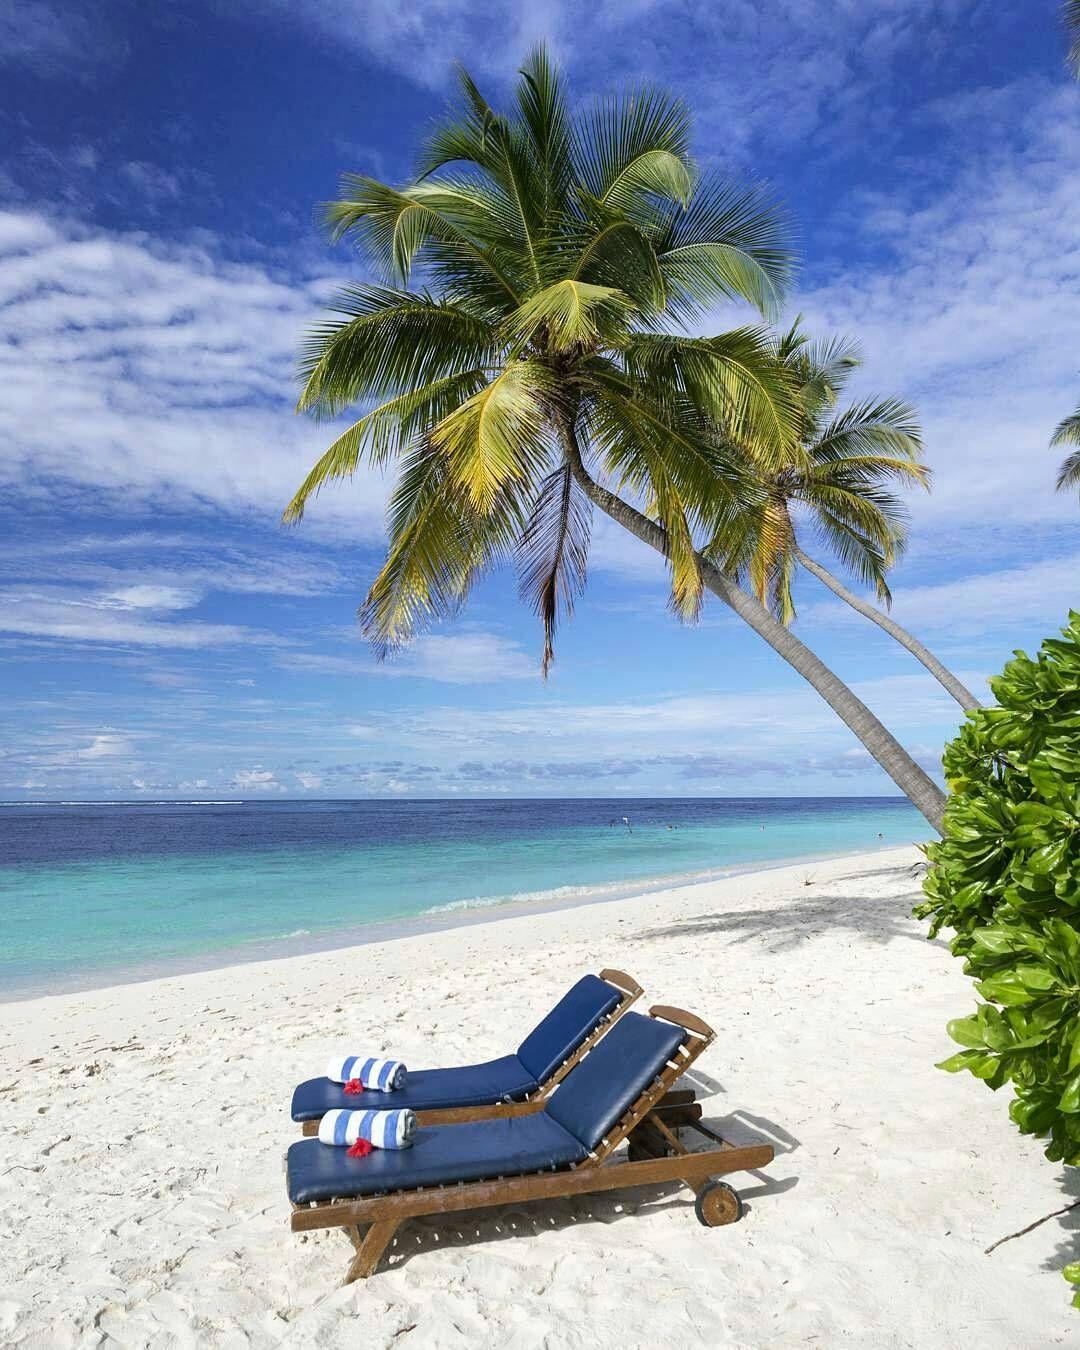 Sun Island Beach Maldives: The Maldives Island #Maldives